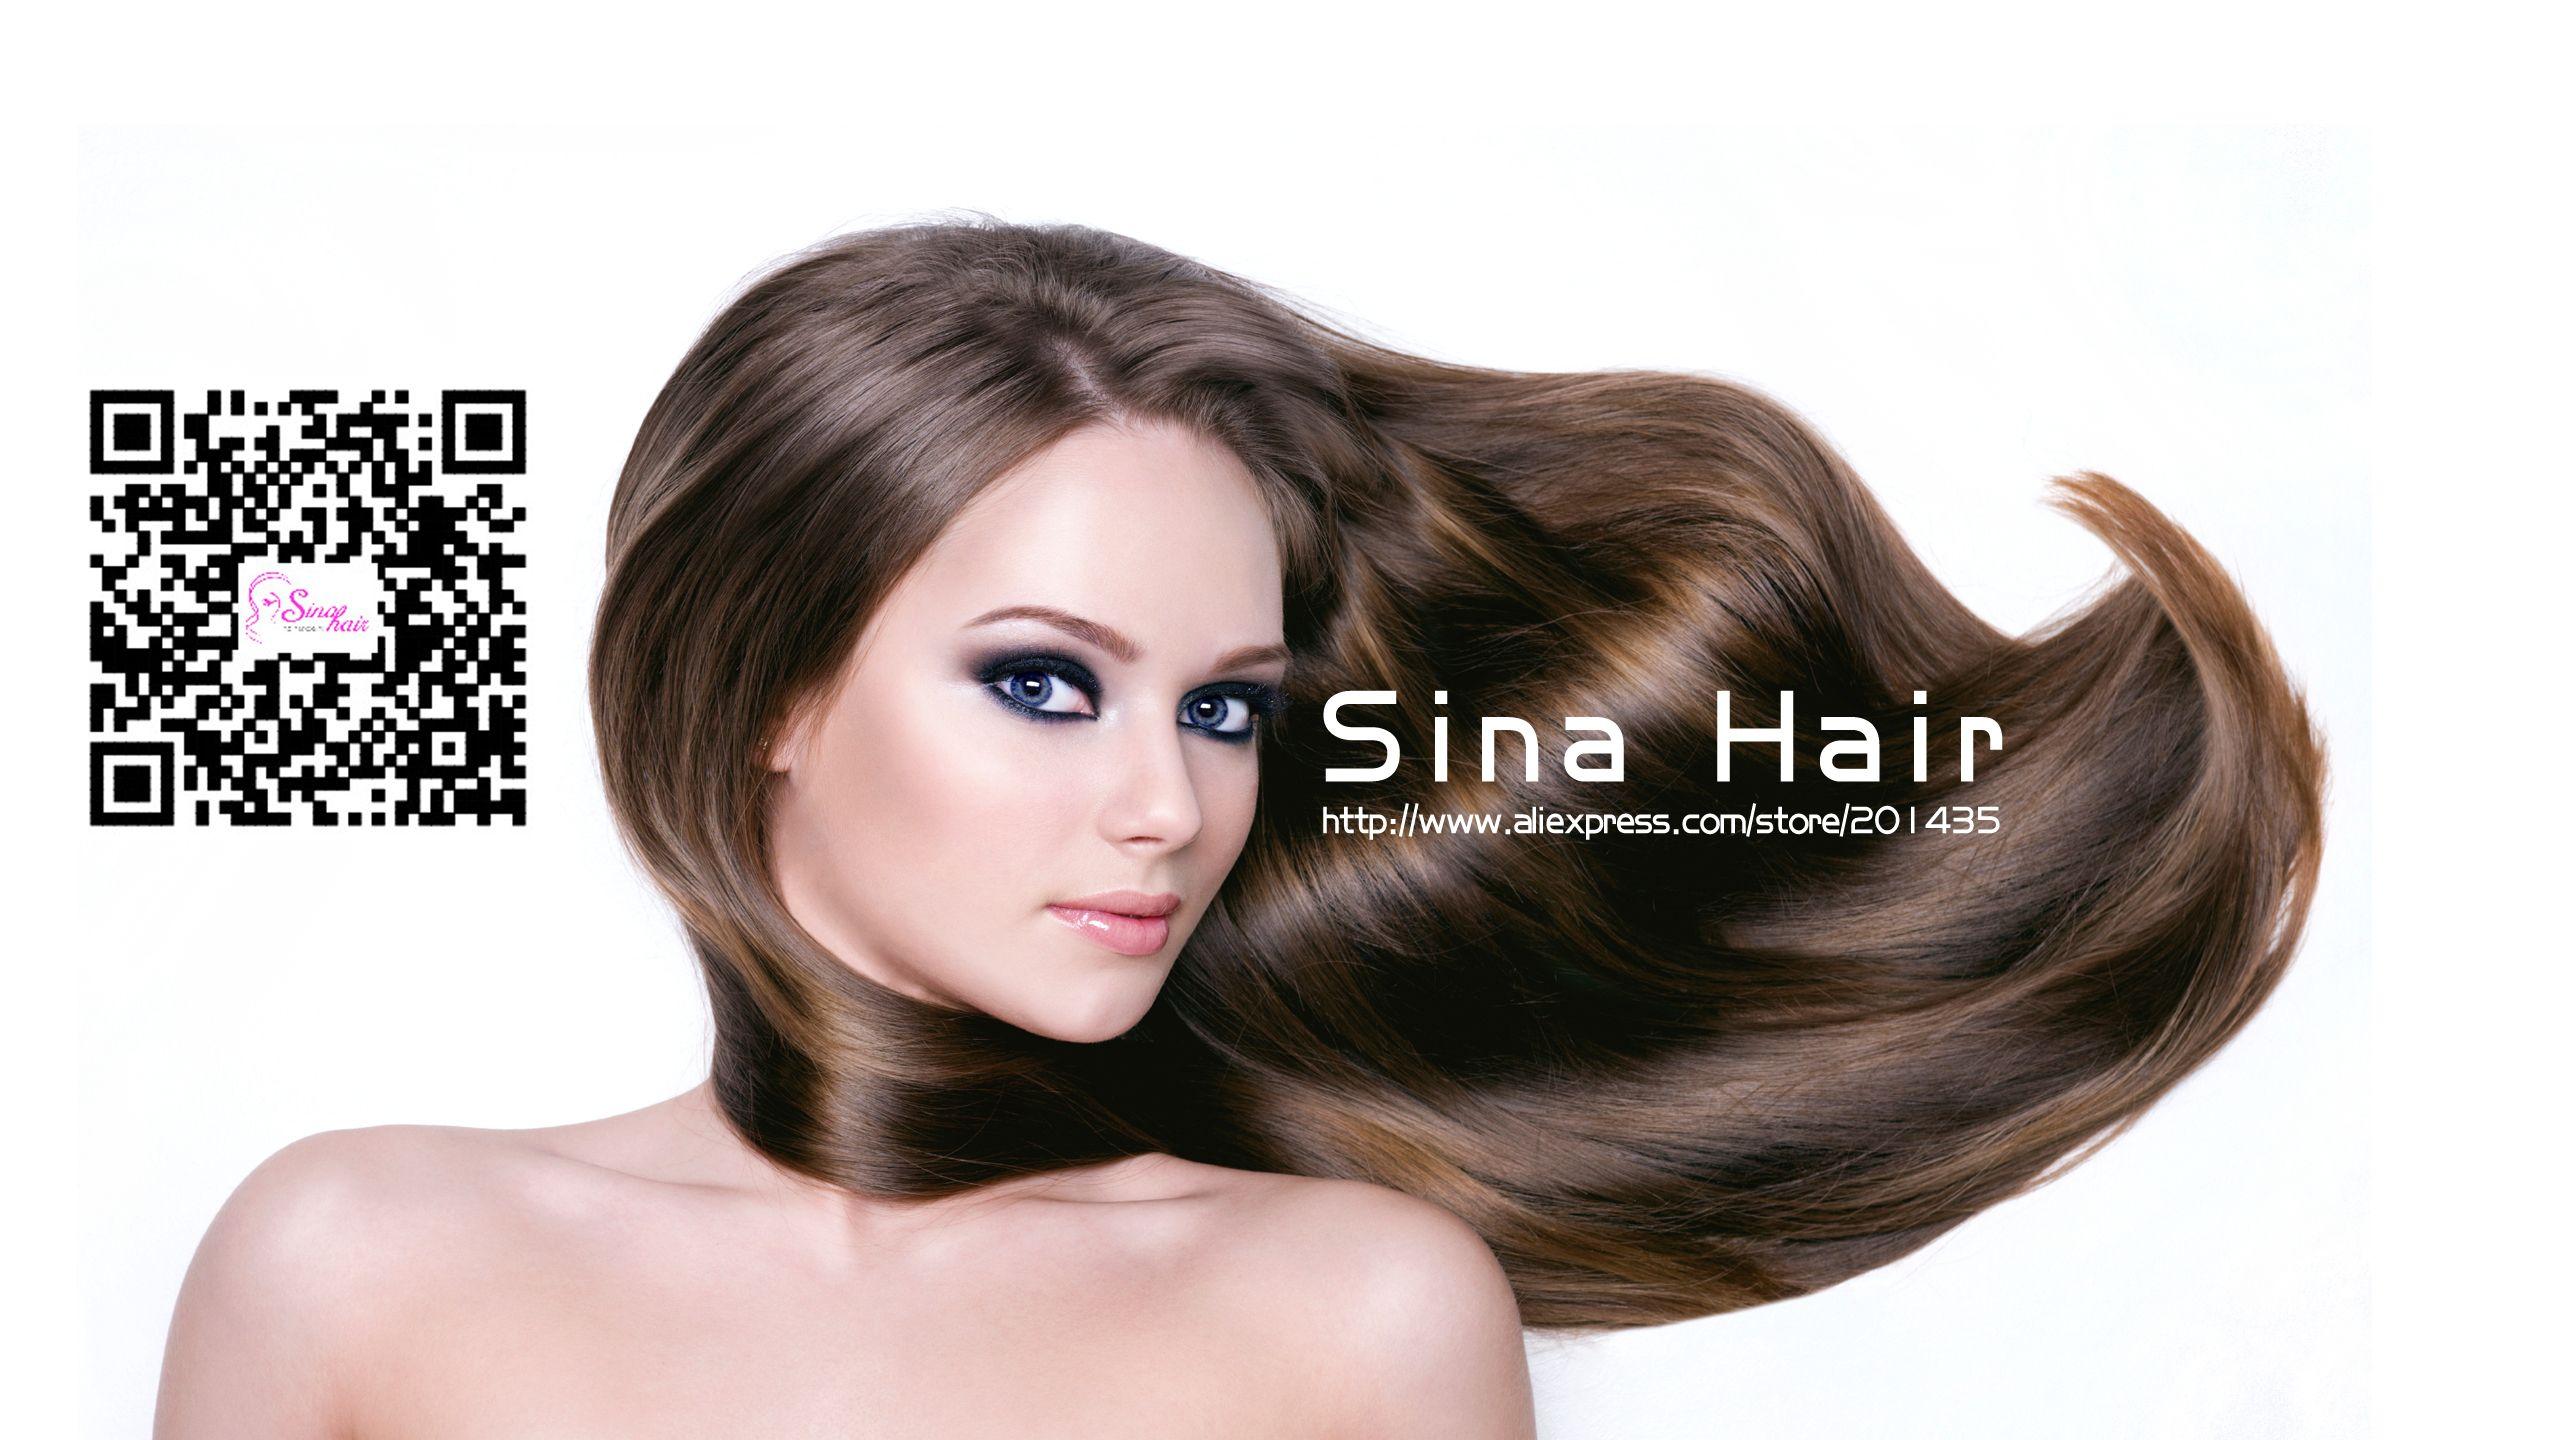 Sina hair products co ltd aliexpress shop iexpress